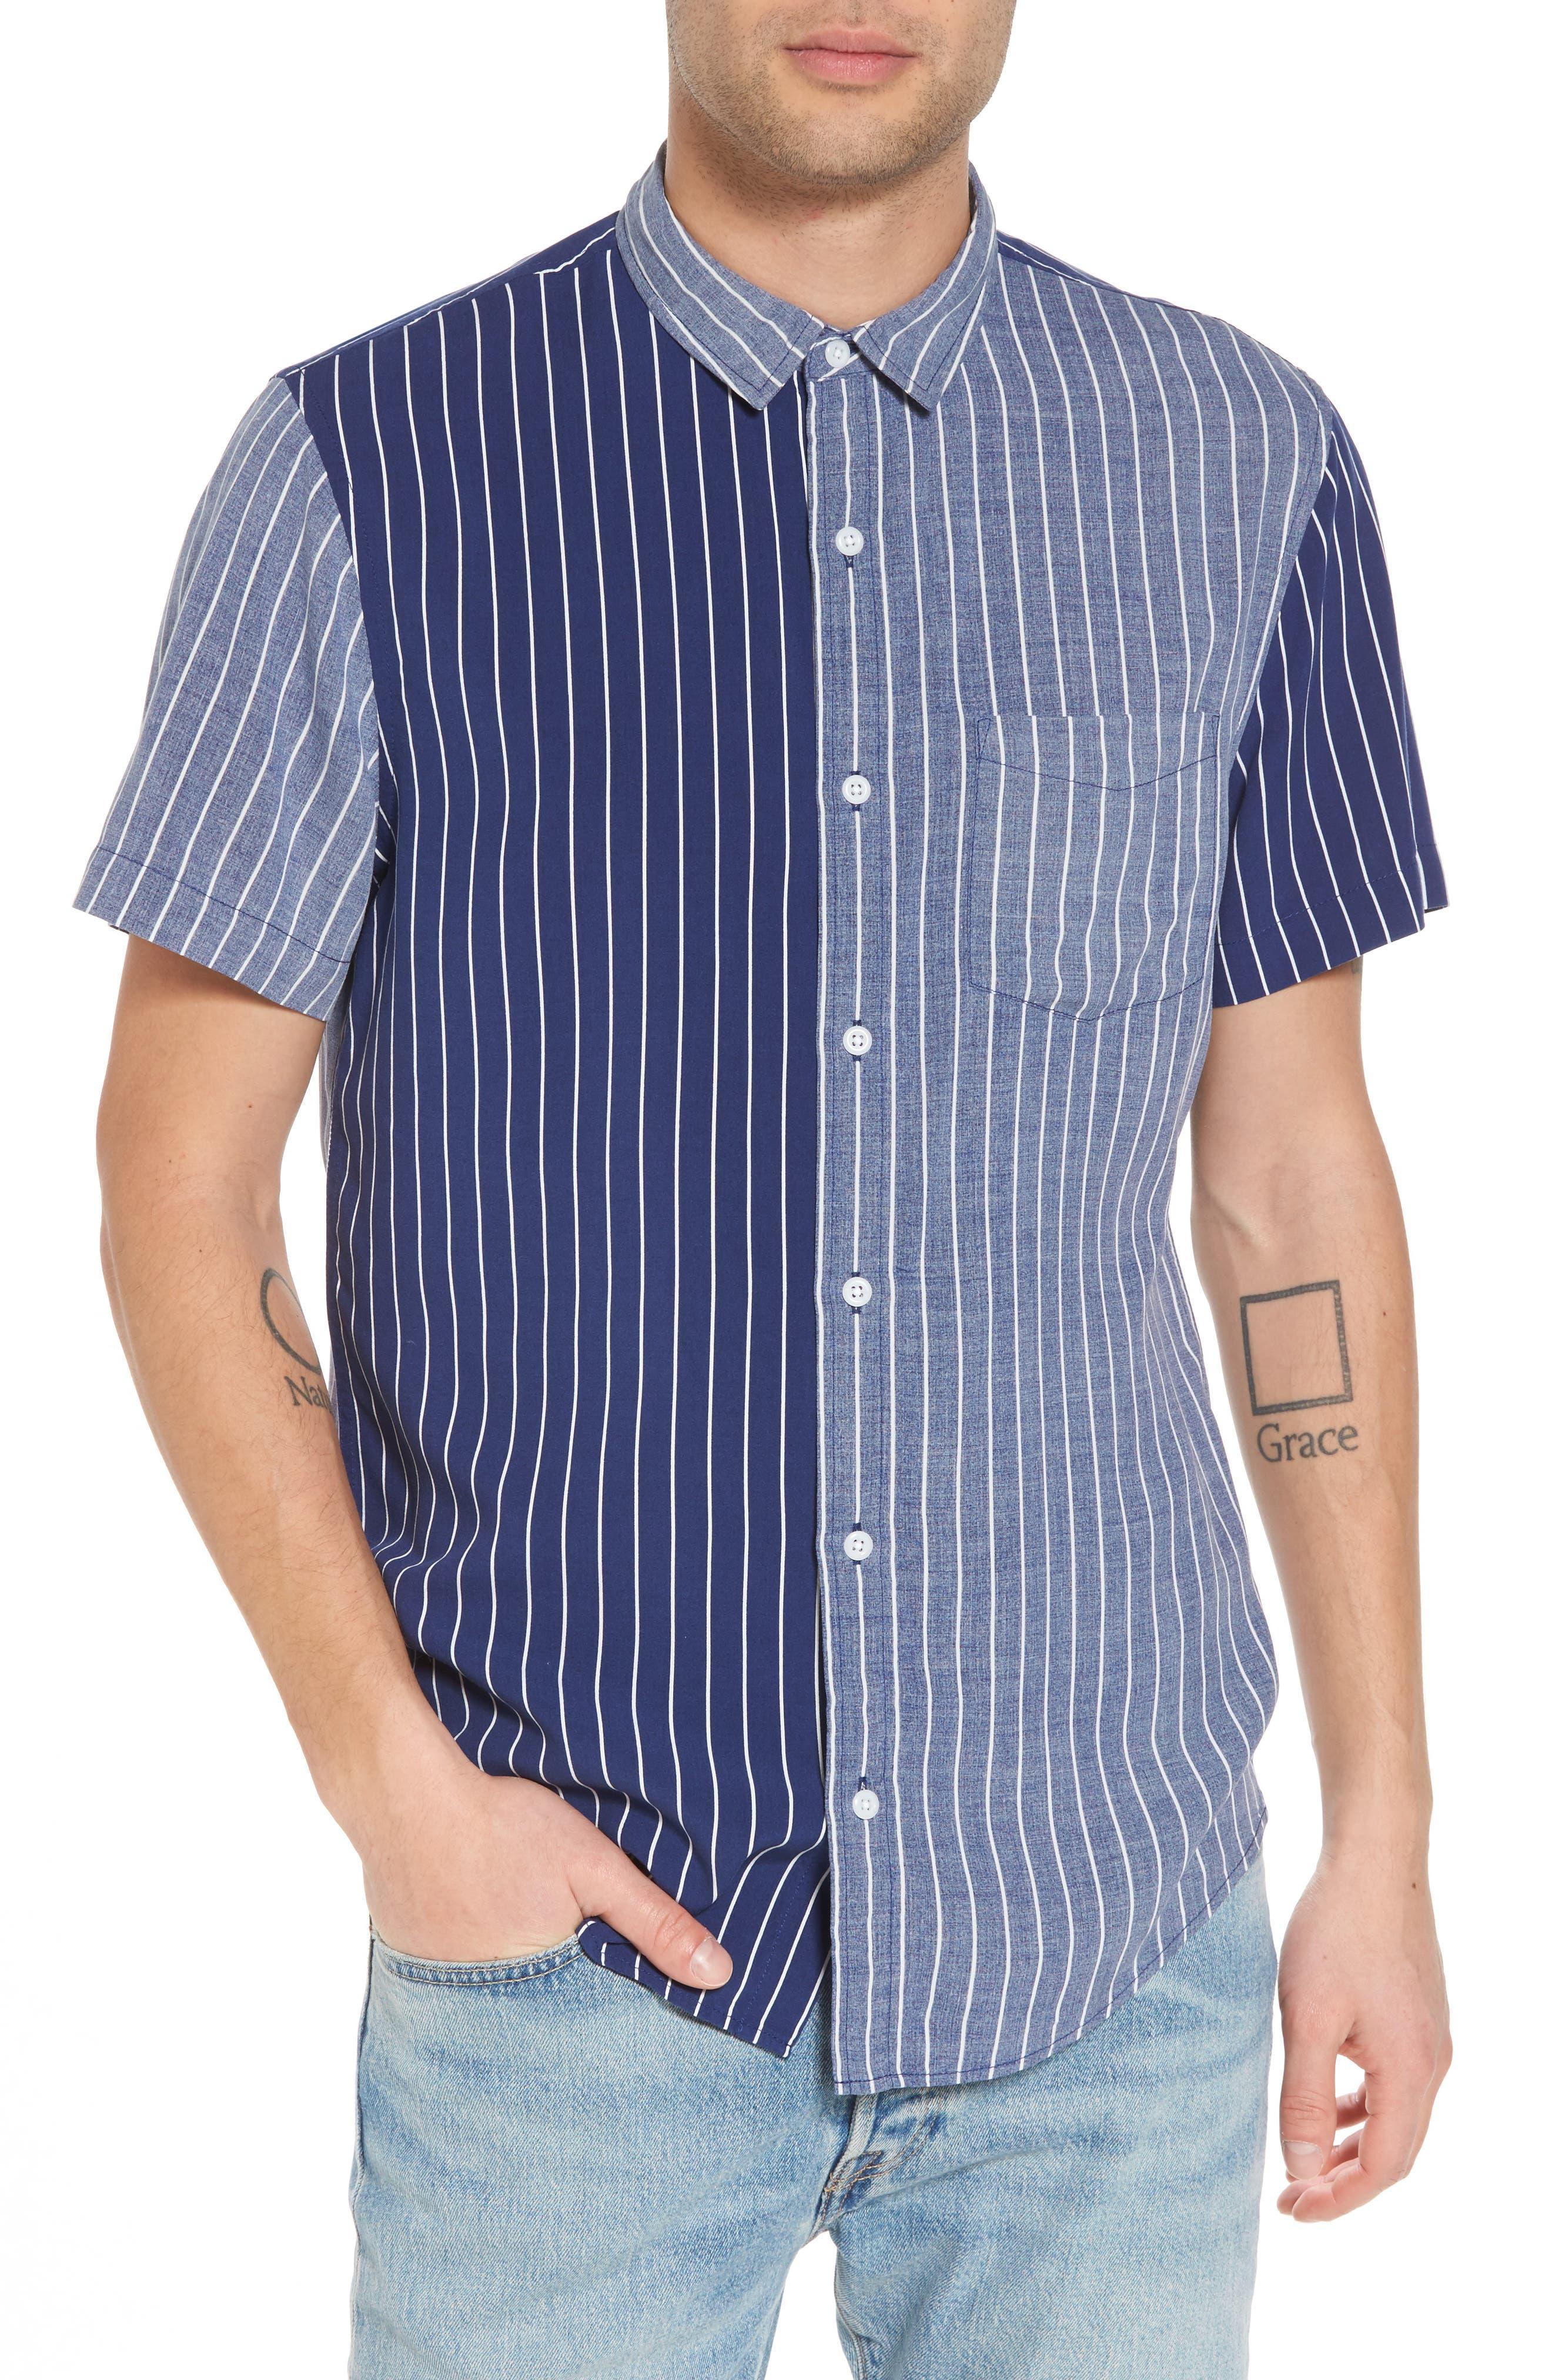 The Rail Short Sleeve Colorblock Stripe Shirt